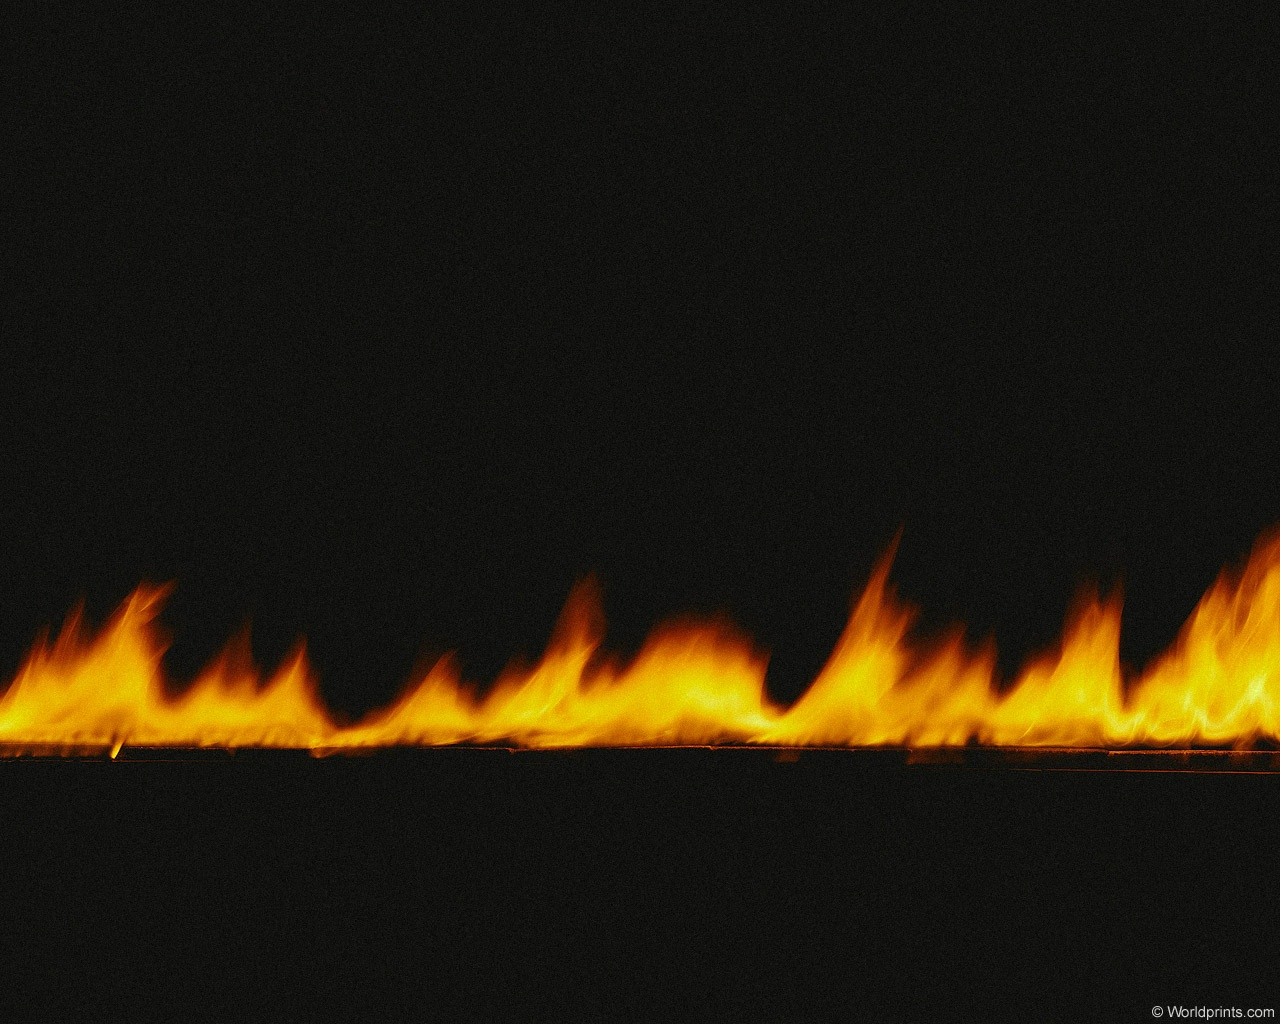 fire line WallpaperSuggestcom wallpapers 1280x1024